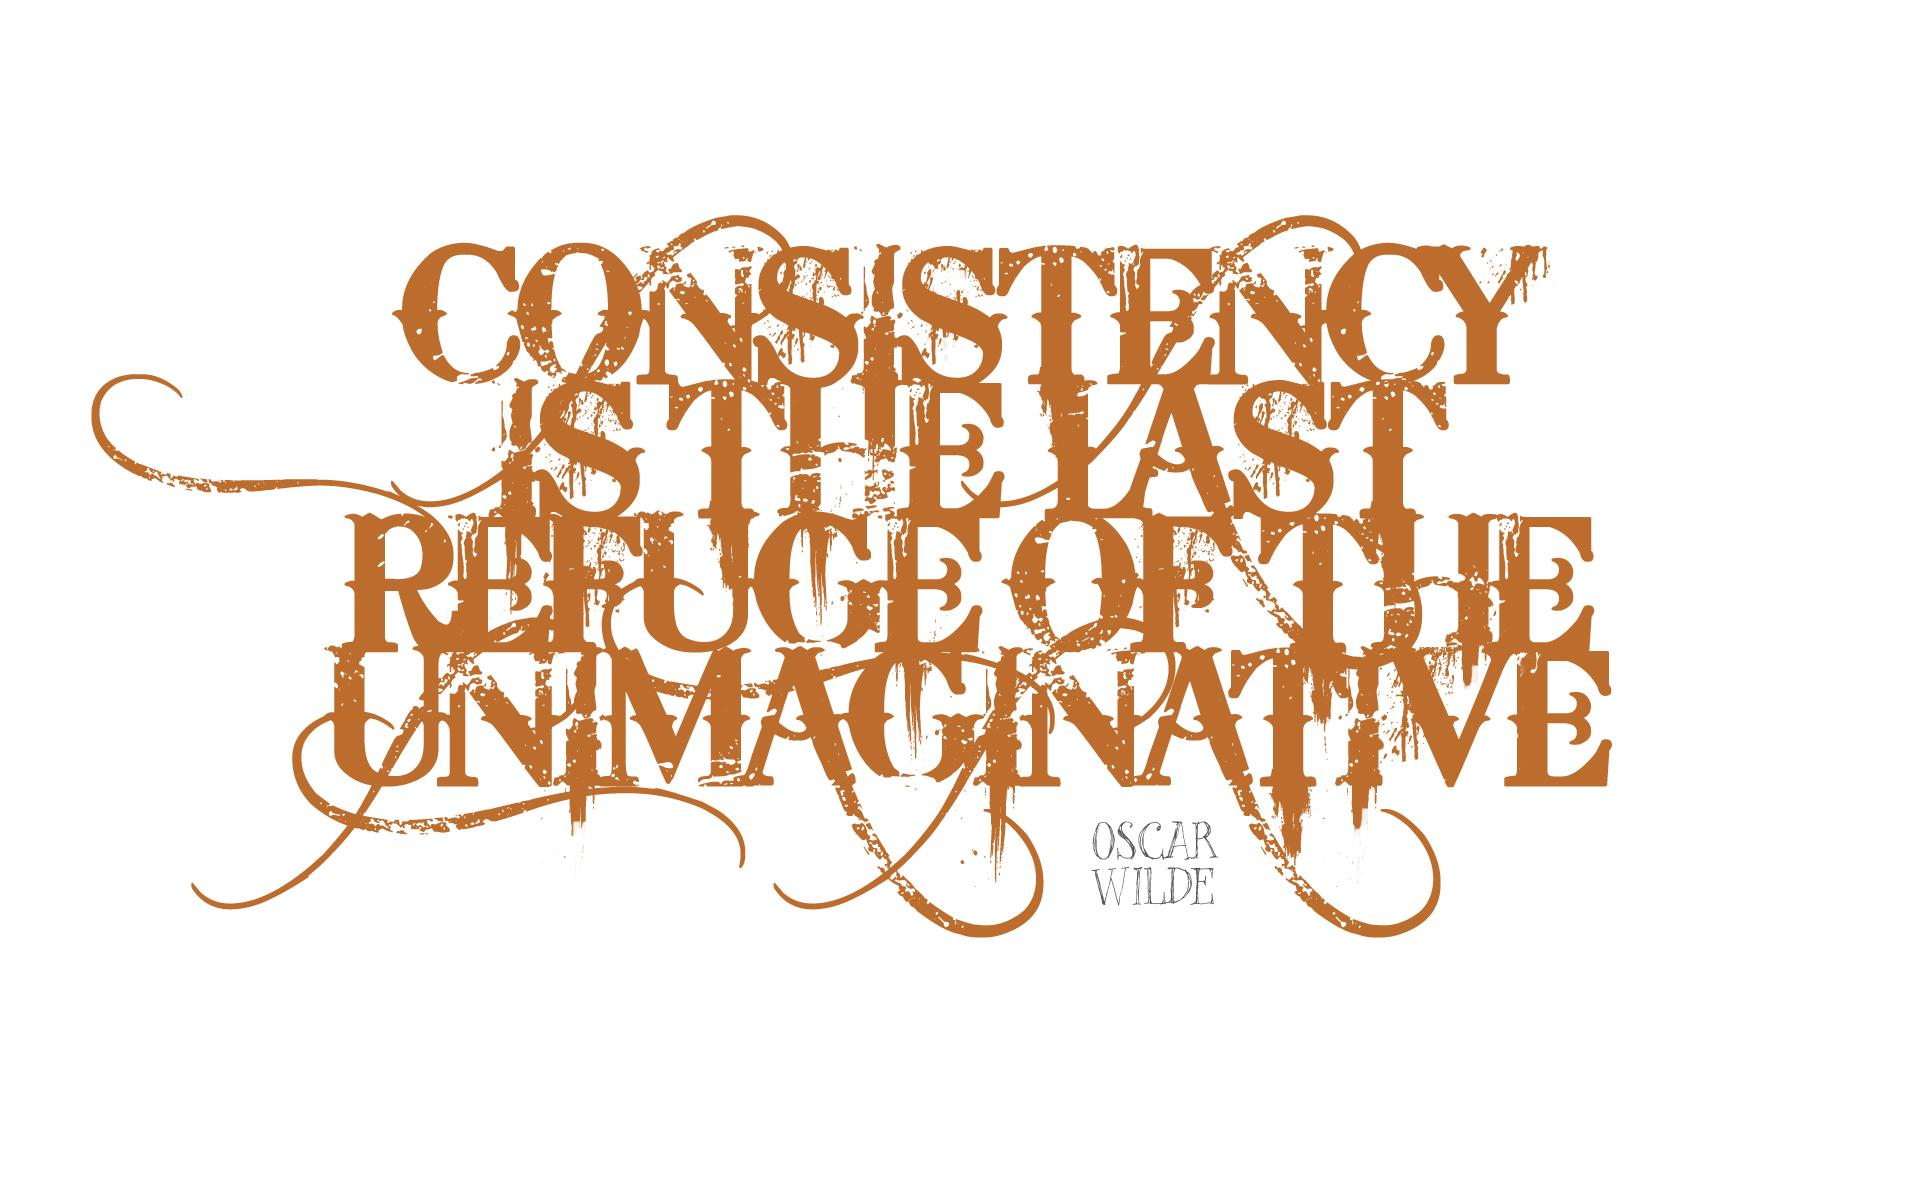 Consistency is the last refuge of the unimaginative. — Oscar Wilde [1920 x 1200]